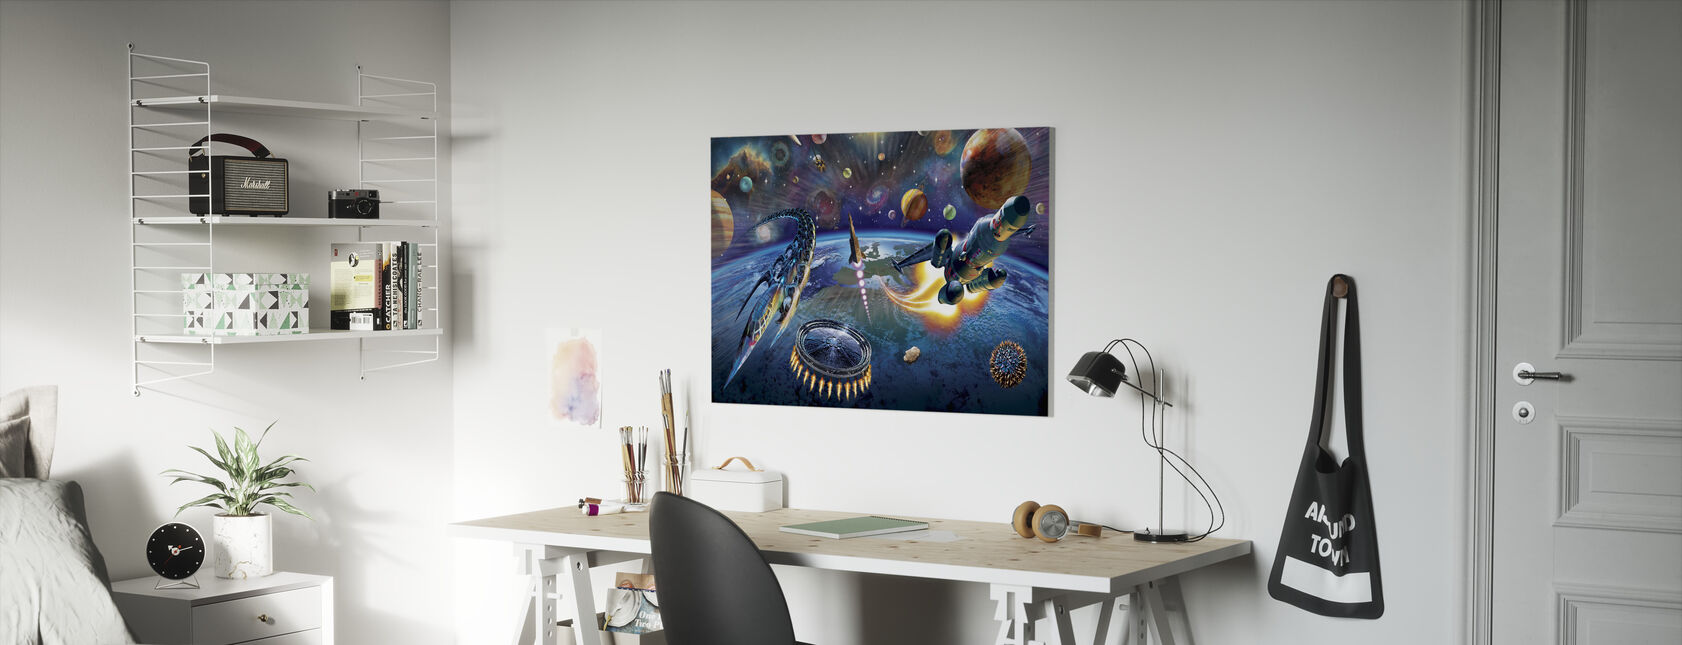 Buitenruimte - Canvas print - Kinderkamer